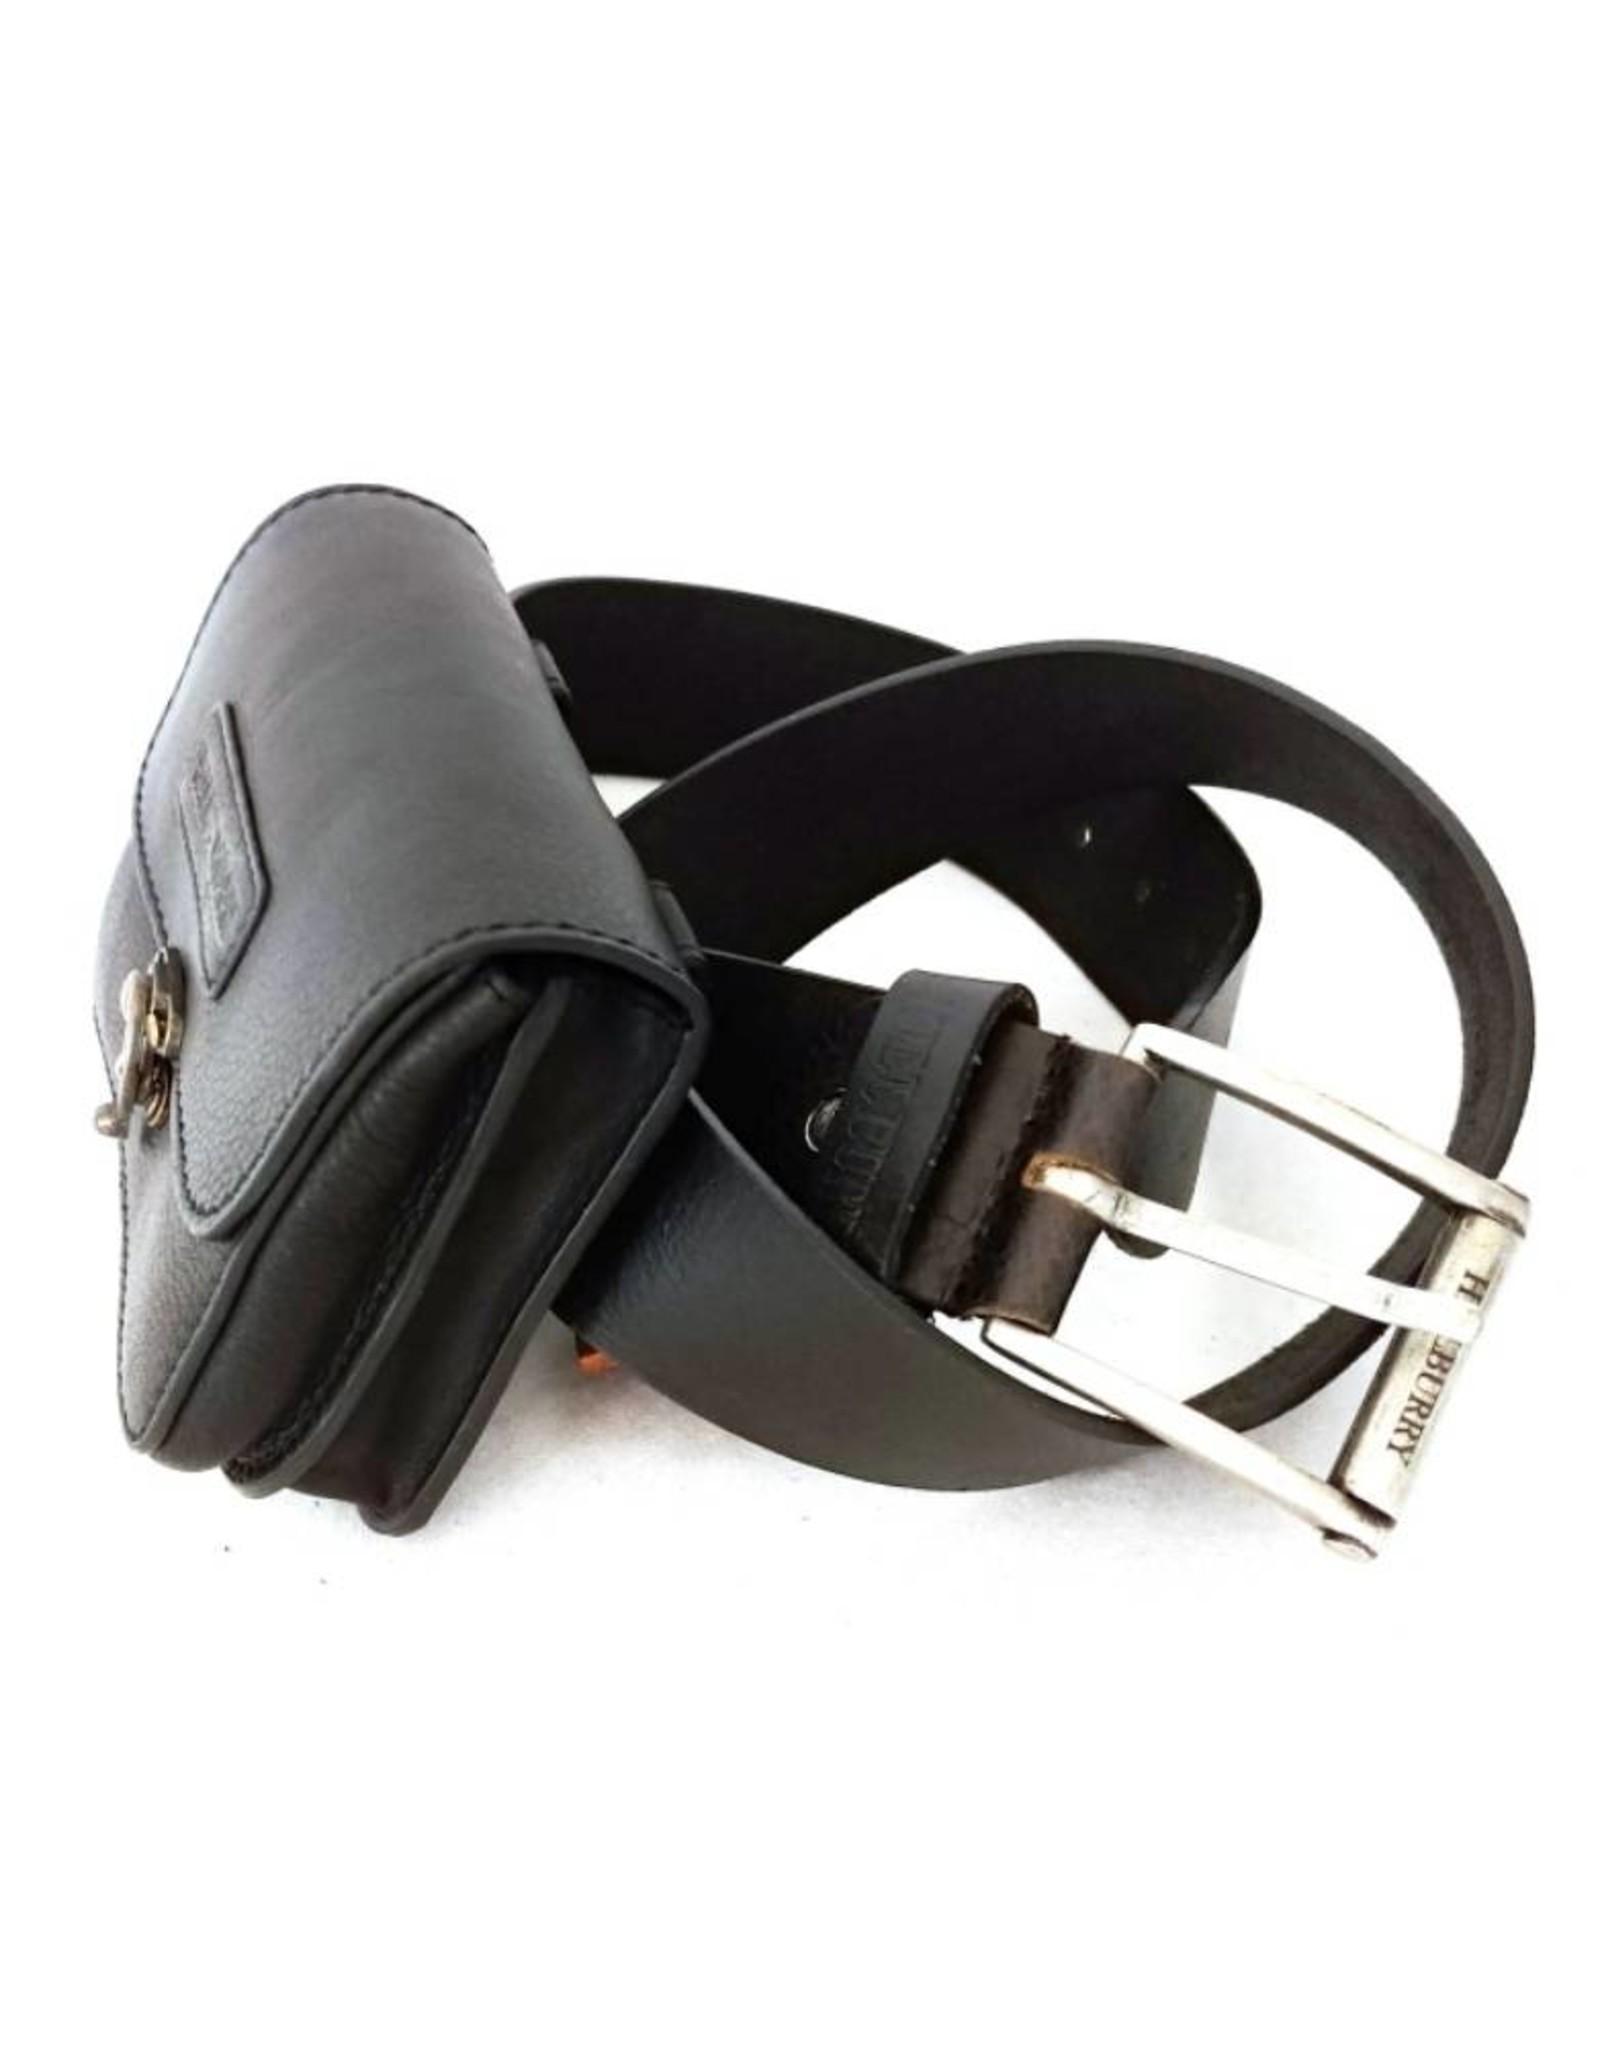 HillBurry Leather bags - Hillburry leather belt bag black 3156